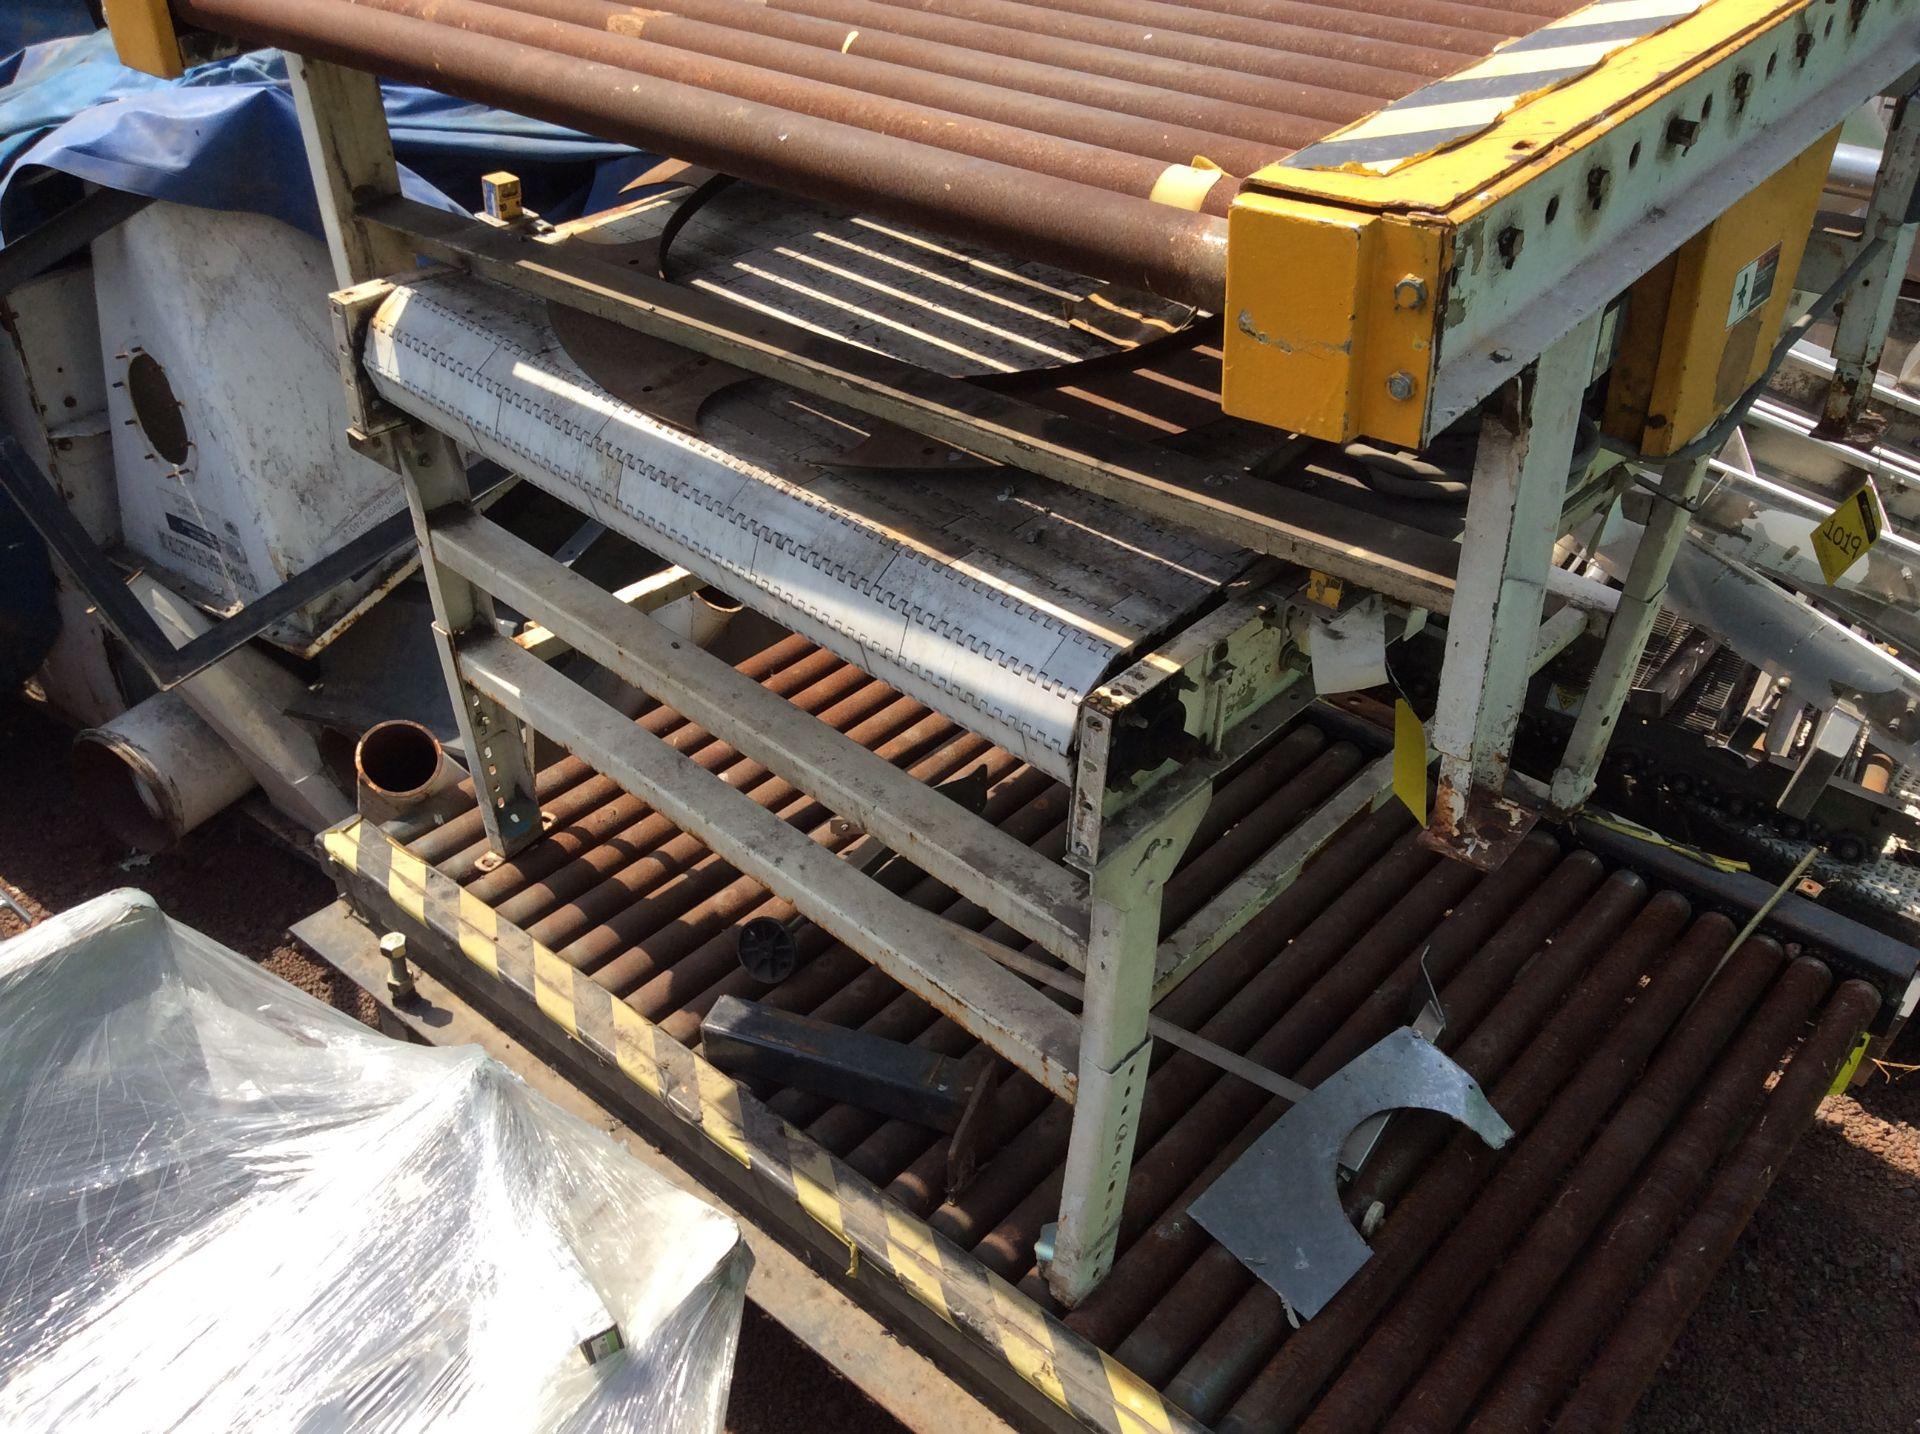 1 Roller conveyor, measures 1.37 x 1.50 x .67, 1 Conveyor measures 1.20 x 2.08x .65 - Image 5 of 8